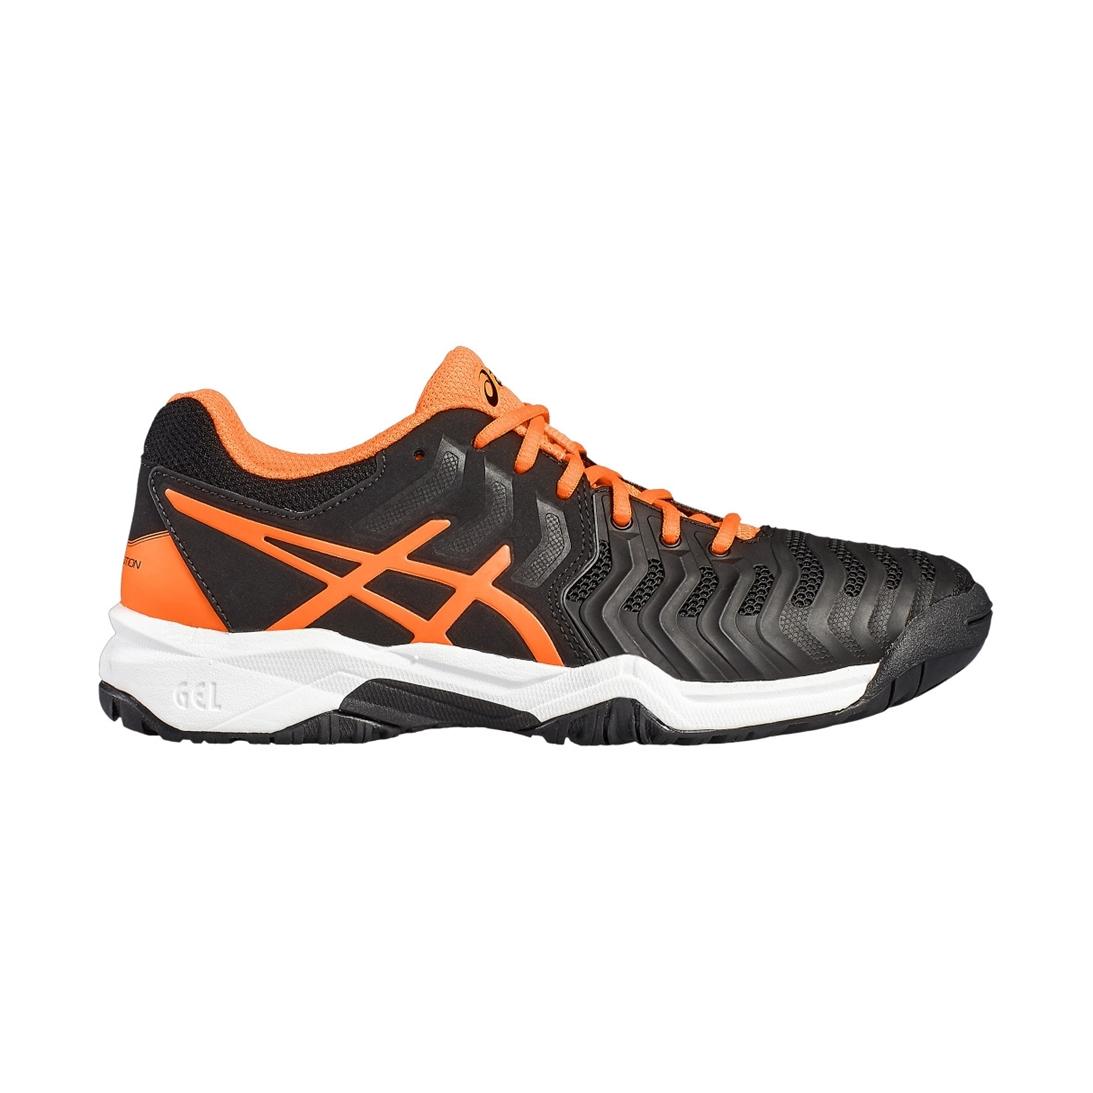 Asics Gel-Resolution GS Black/Orange 35